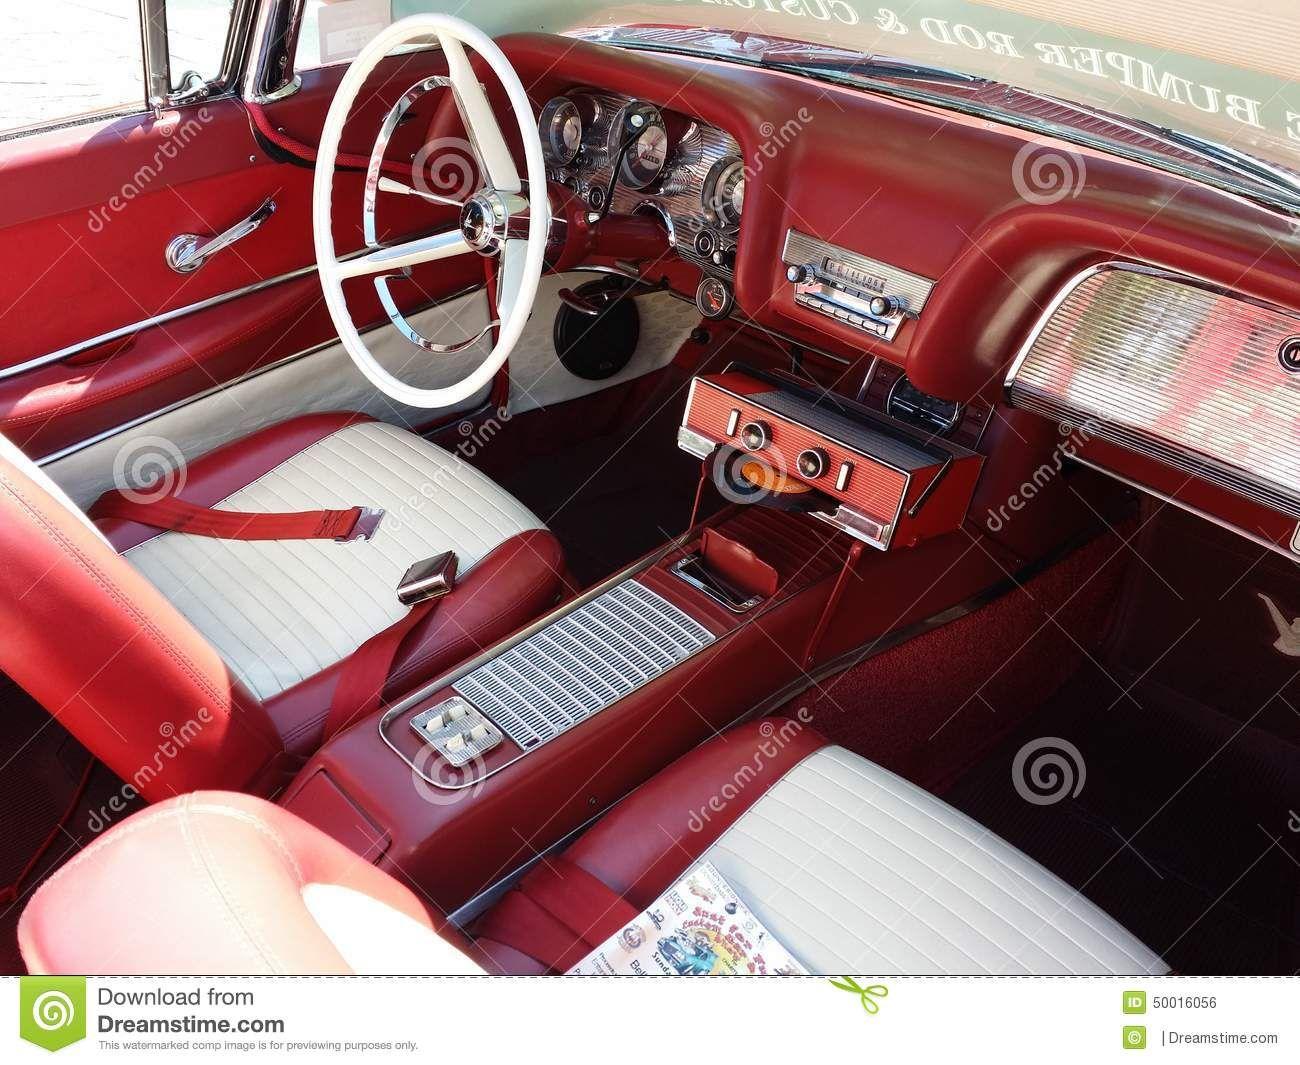 beautiful vintage car interiors - Google Search | Getaways ...